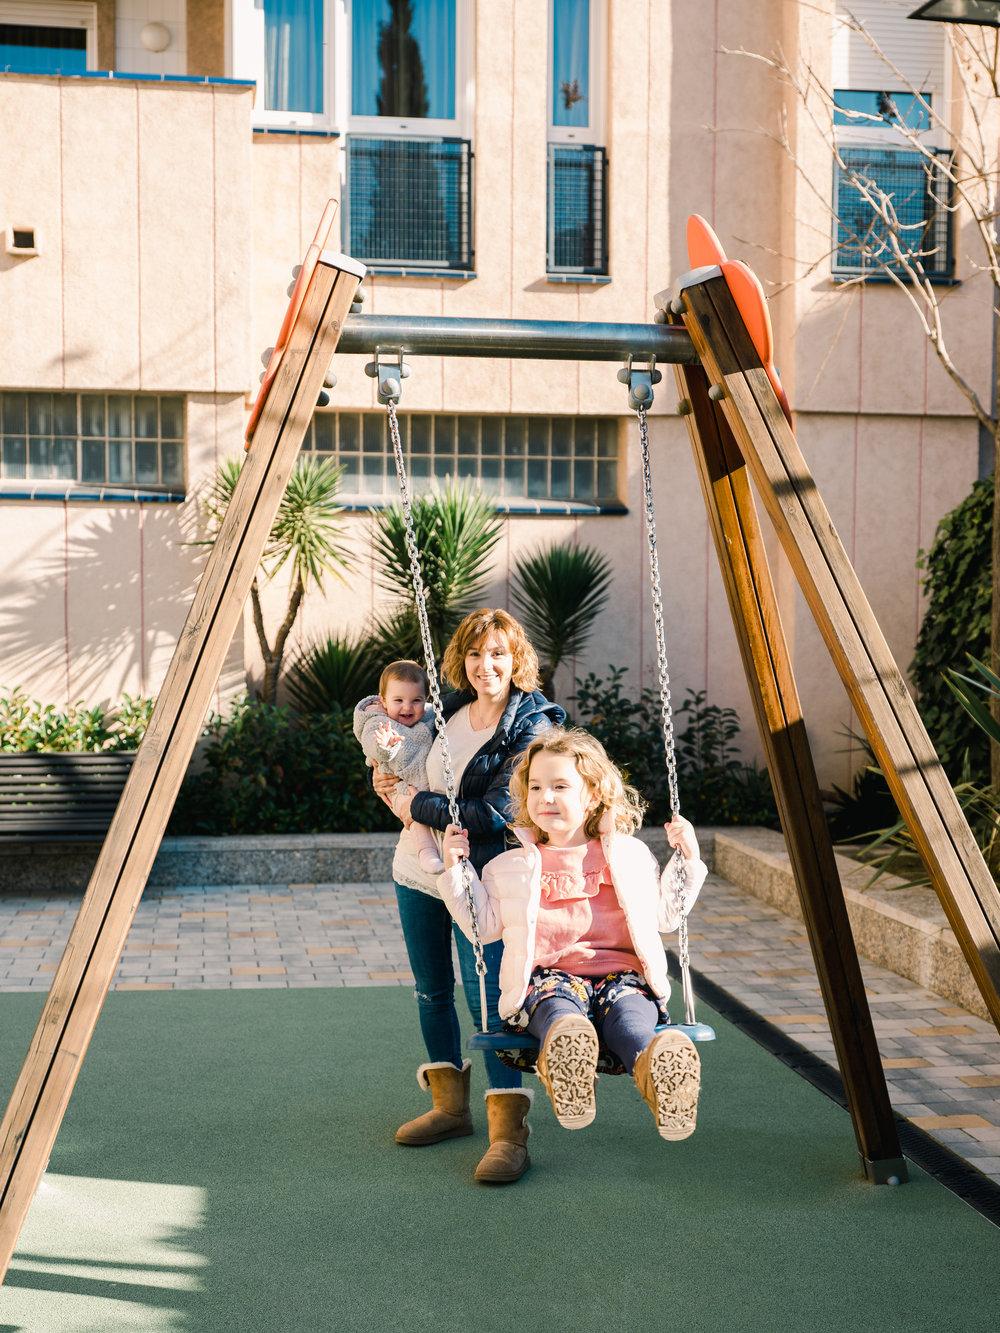 fotografia-infantil-familiar44.jpg